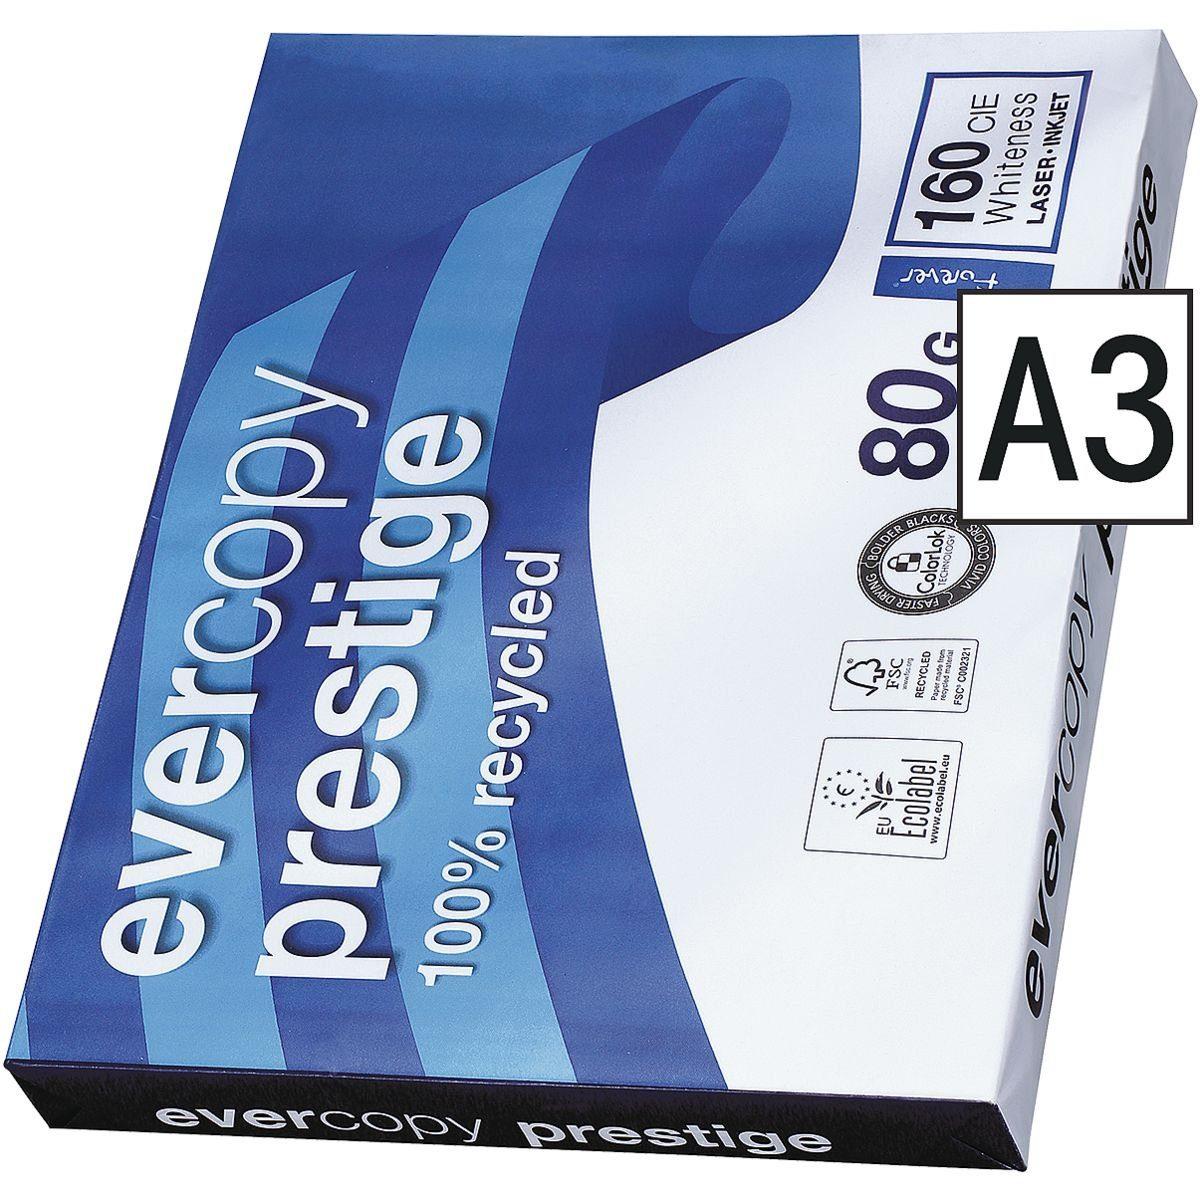 Clairefontaine Recyclingpapier »Everycopy Prestige«